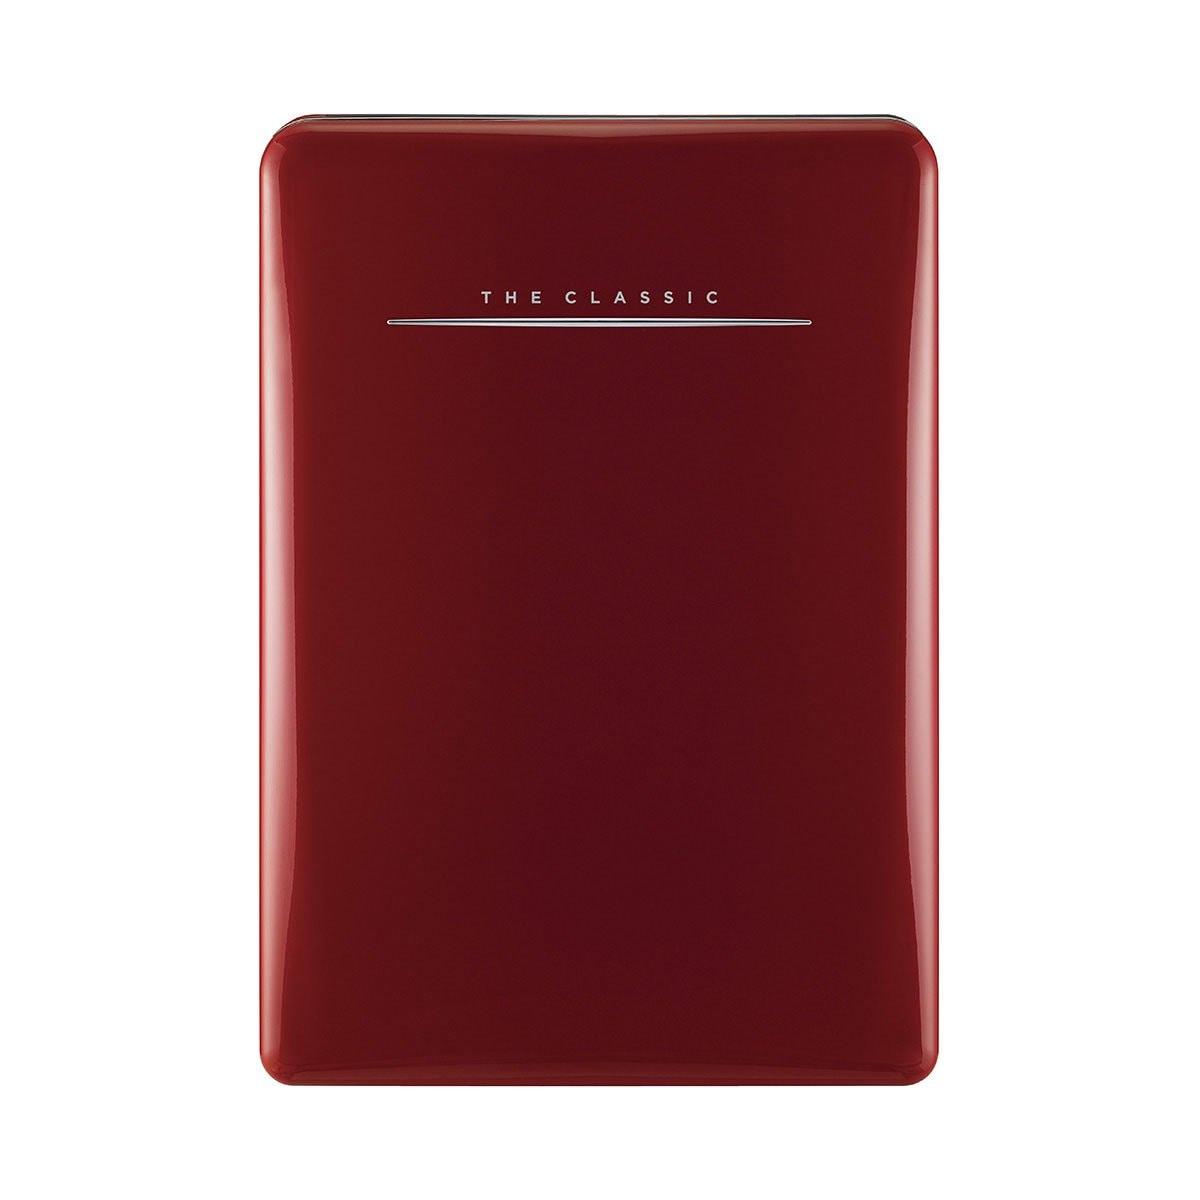 Frigobar Daewoo 2.8 Pies Rojo